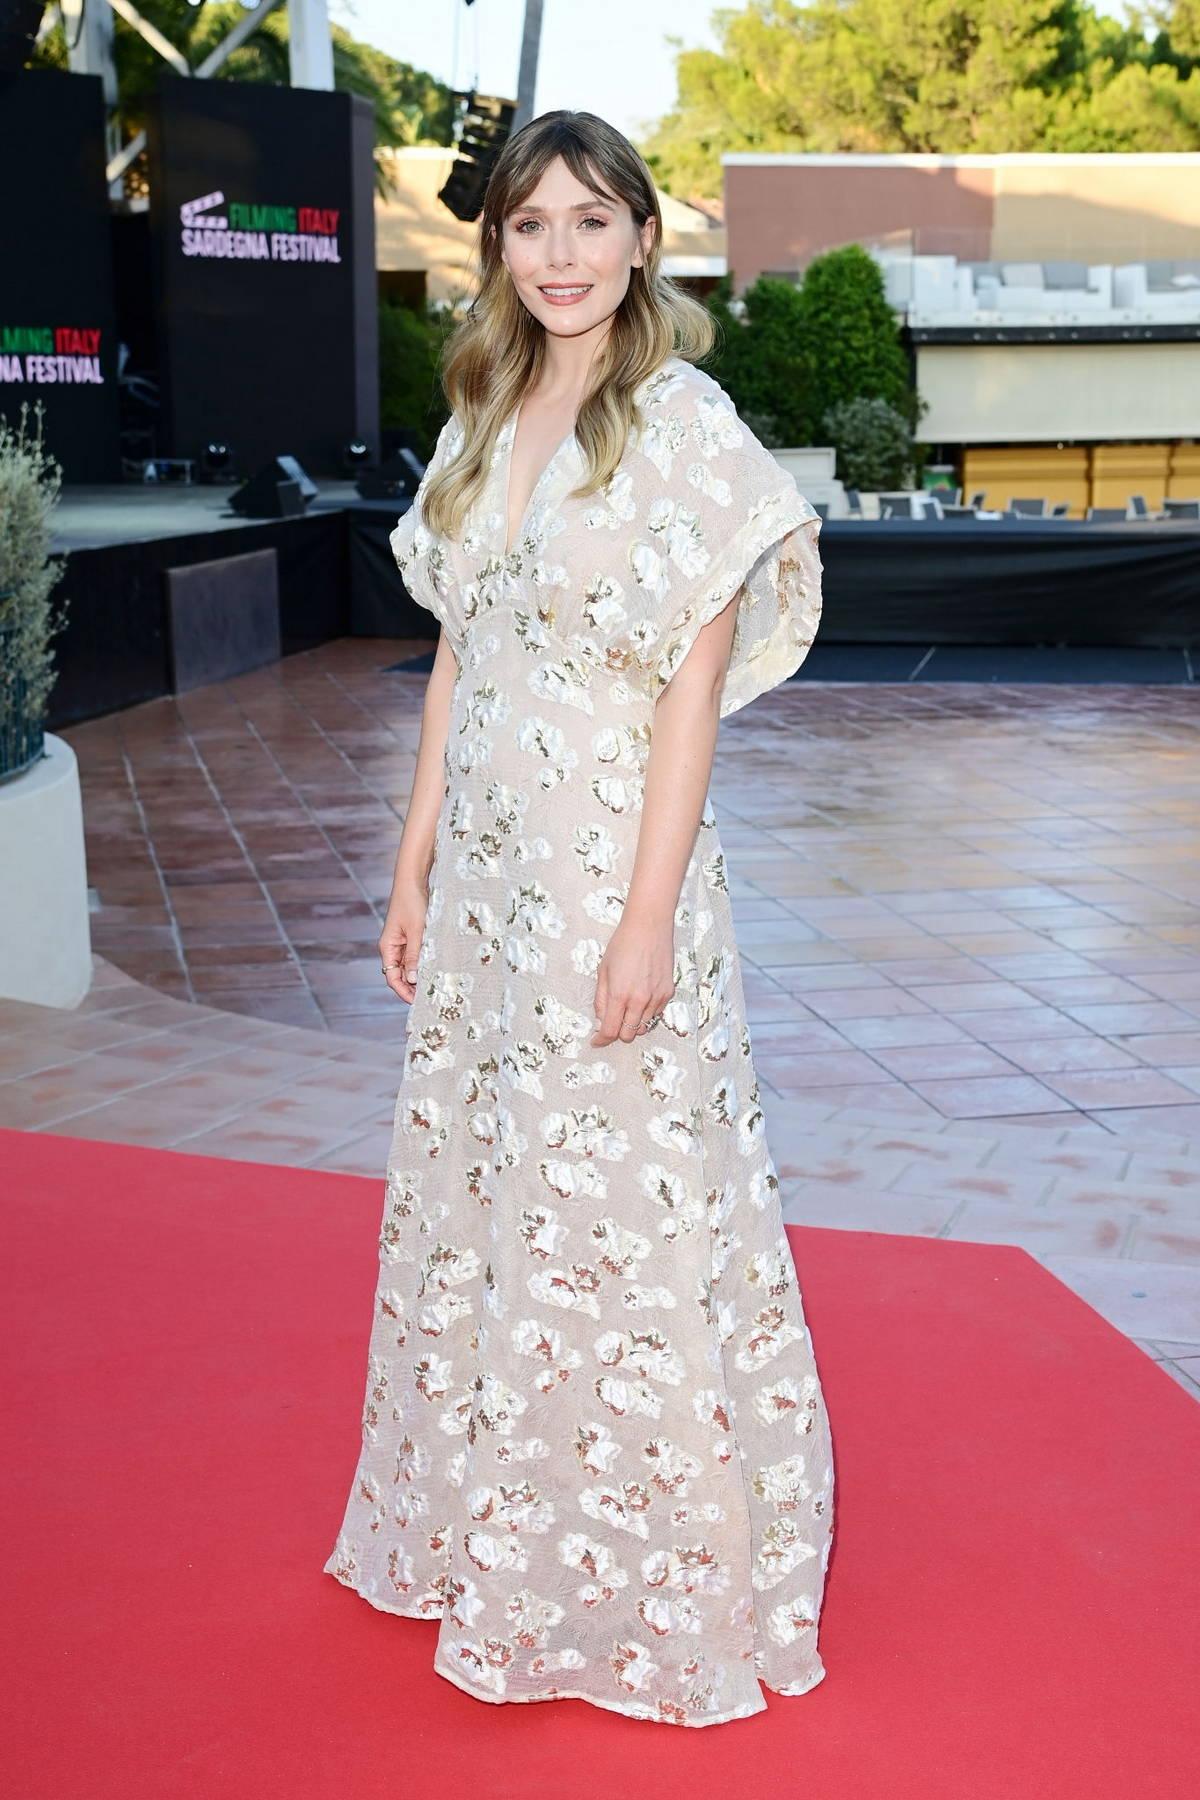 Elizabeth Olsen attends the Filming Italy Festival in Santa Margherita di Pula, Italy